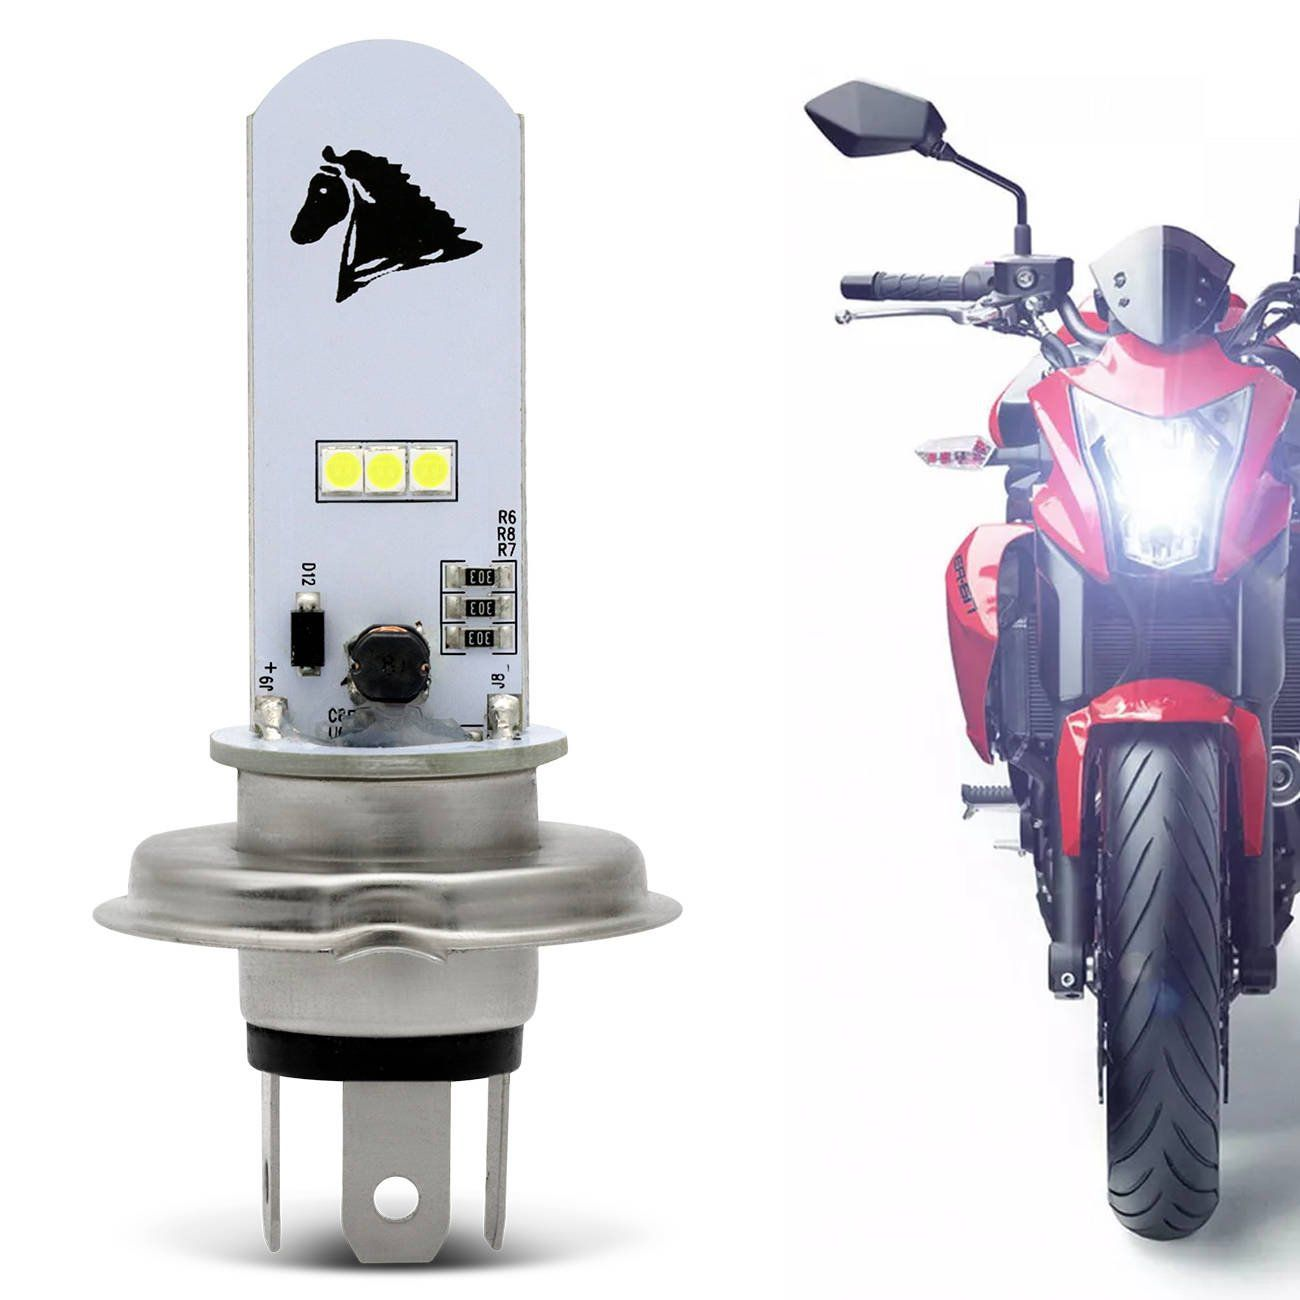 Lampada Led H4 Motos Titan Fan Speed Cb Twister Fazer Yes Ybr